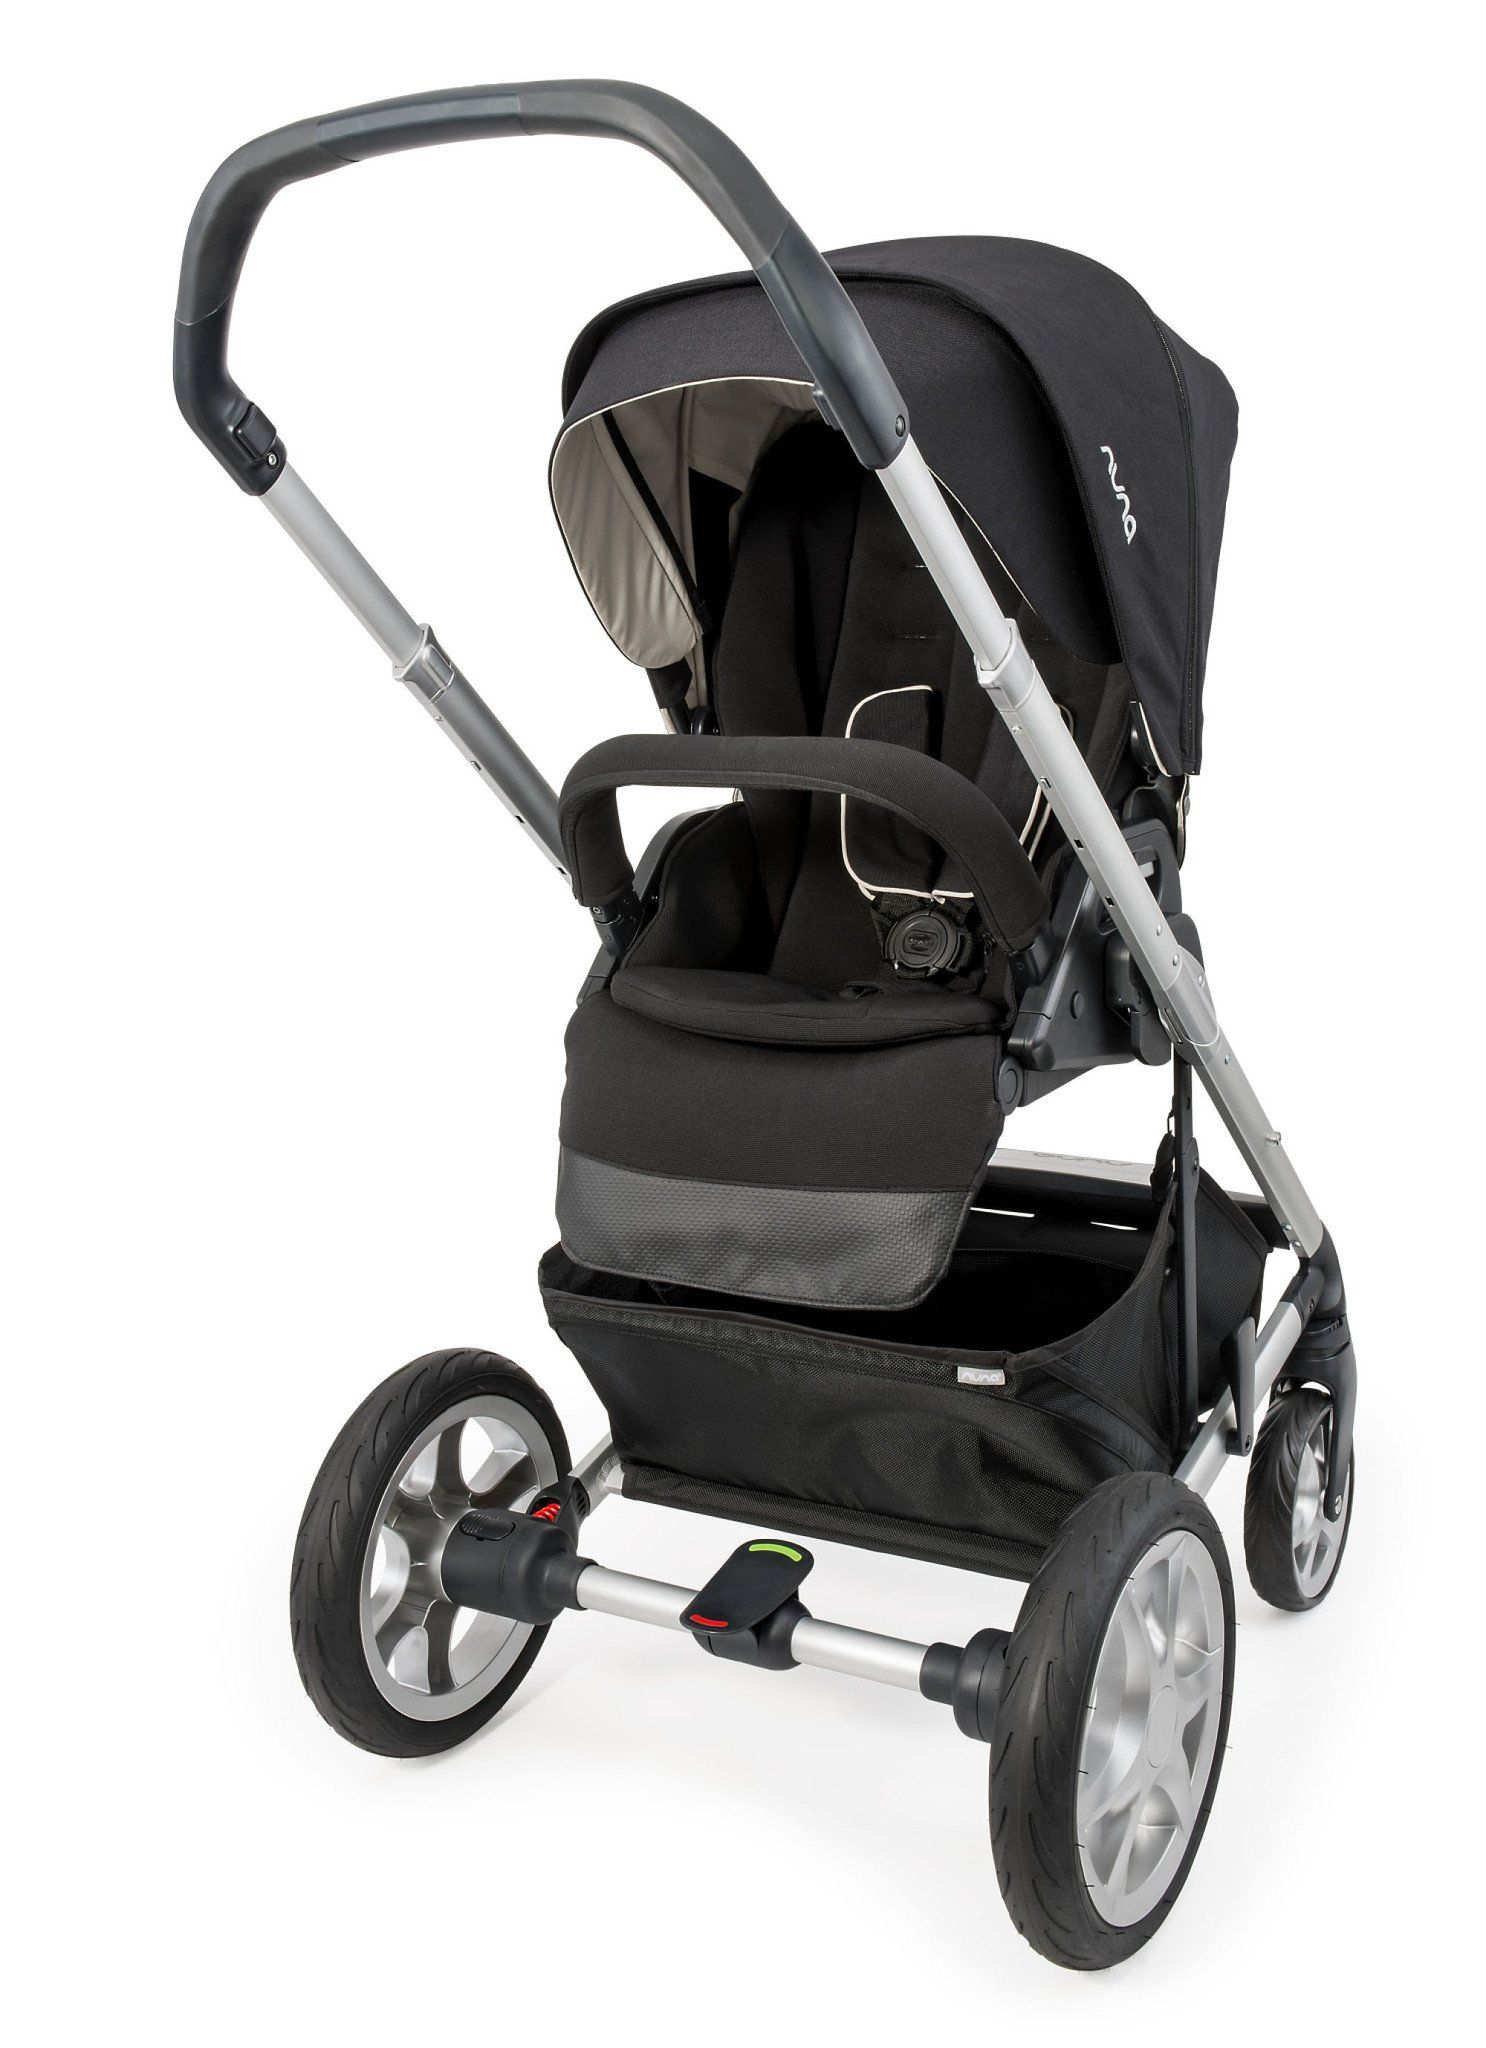 Nuna Mixx Stroller for 499.99 at Nuna